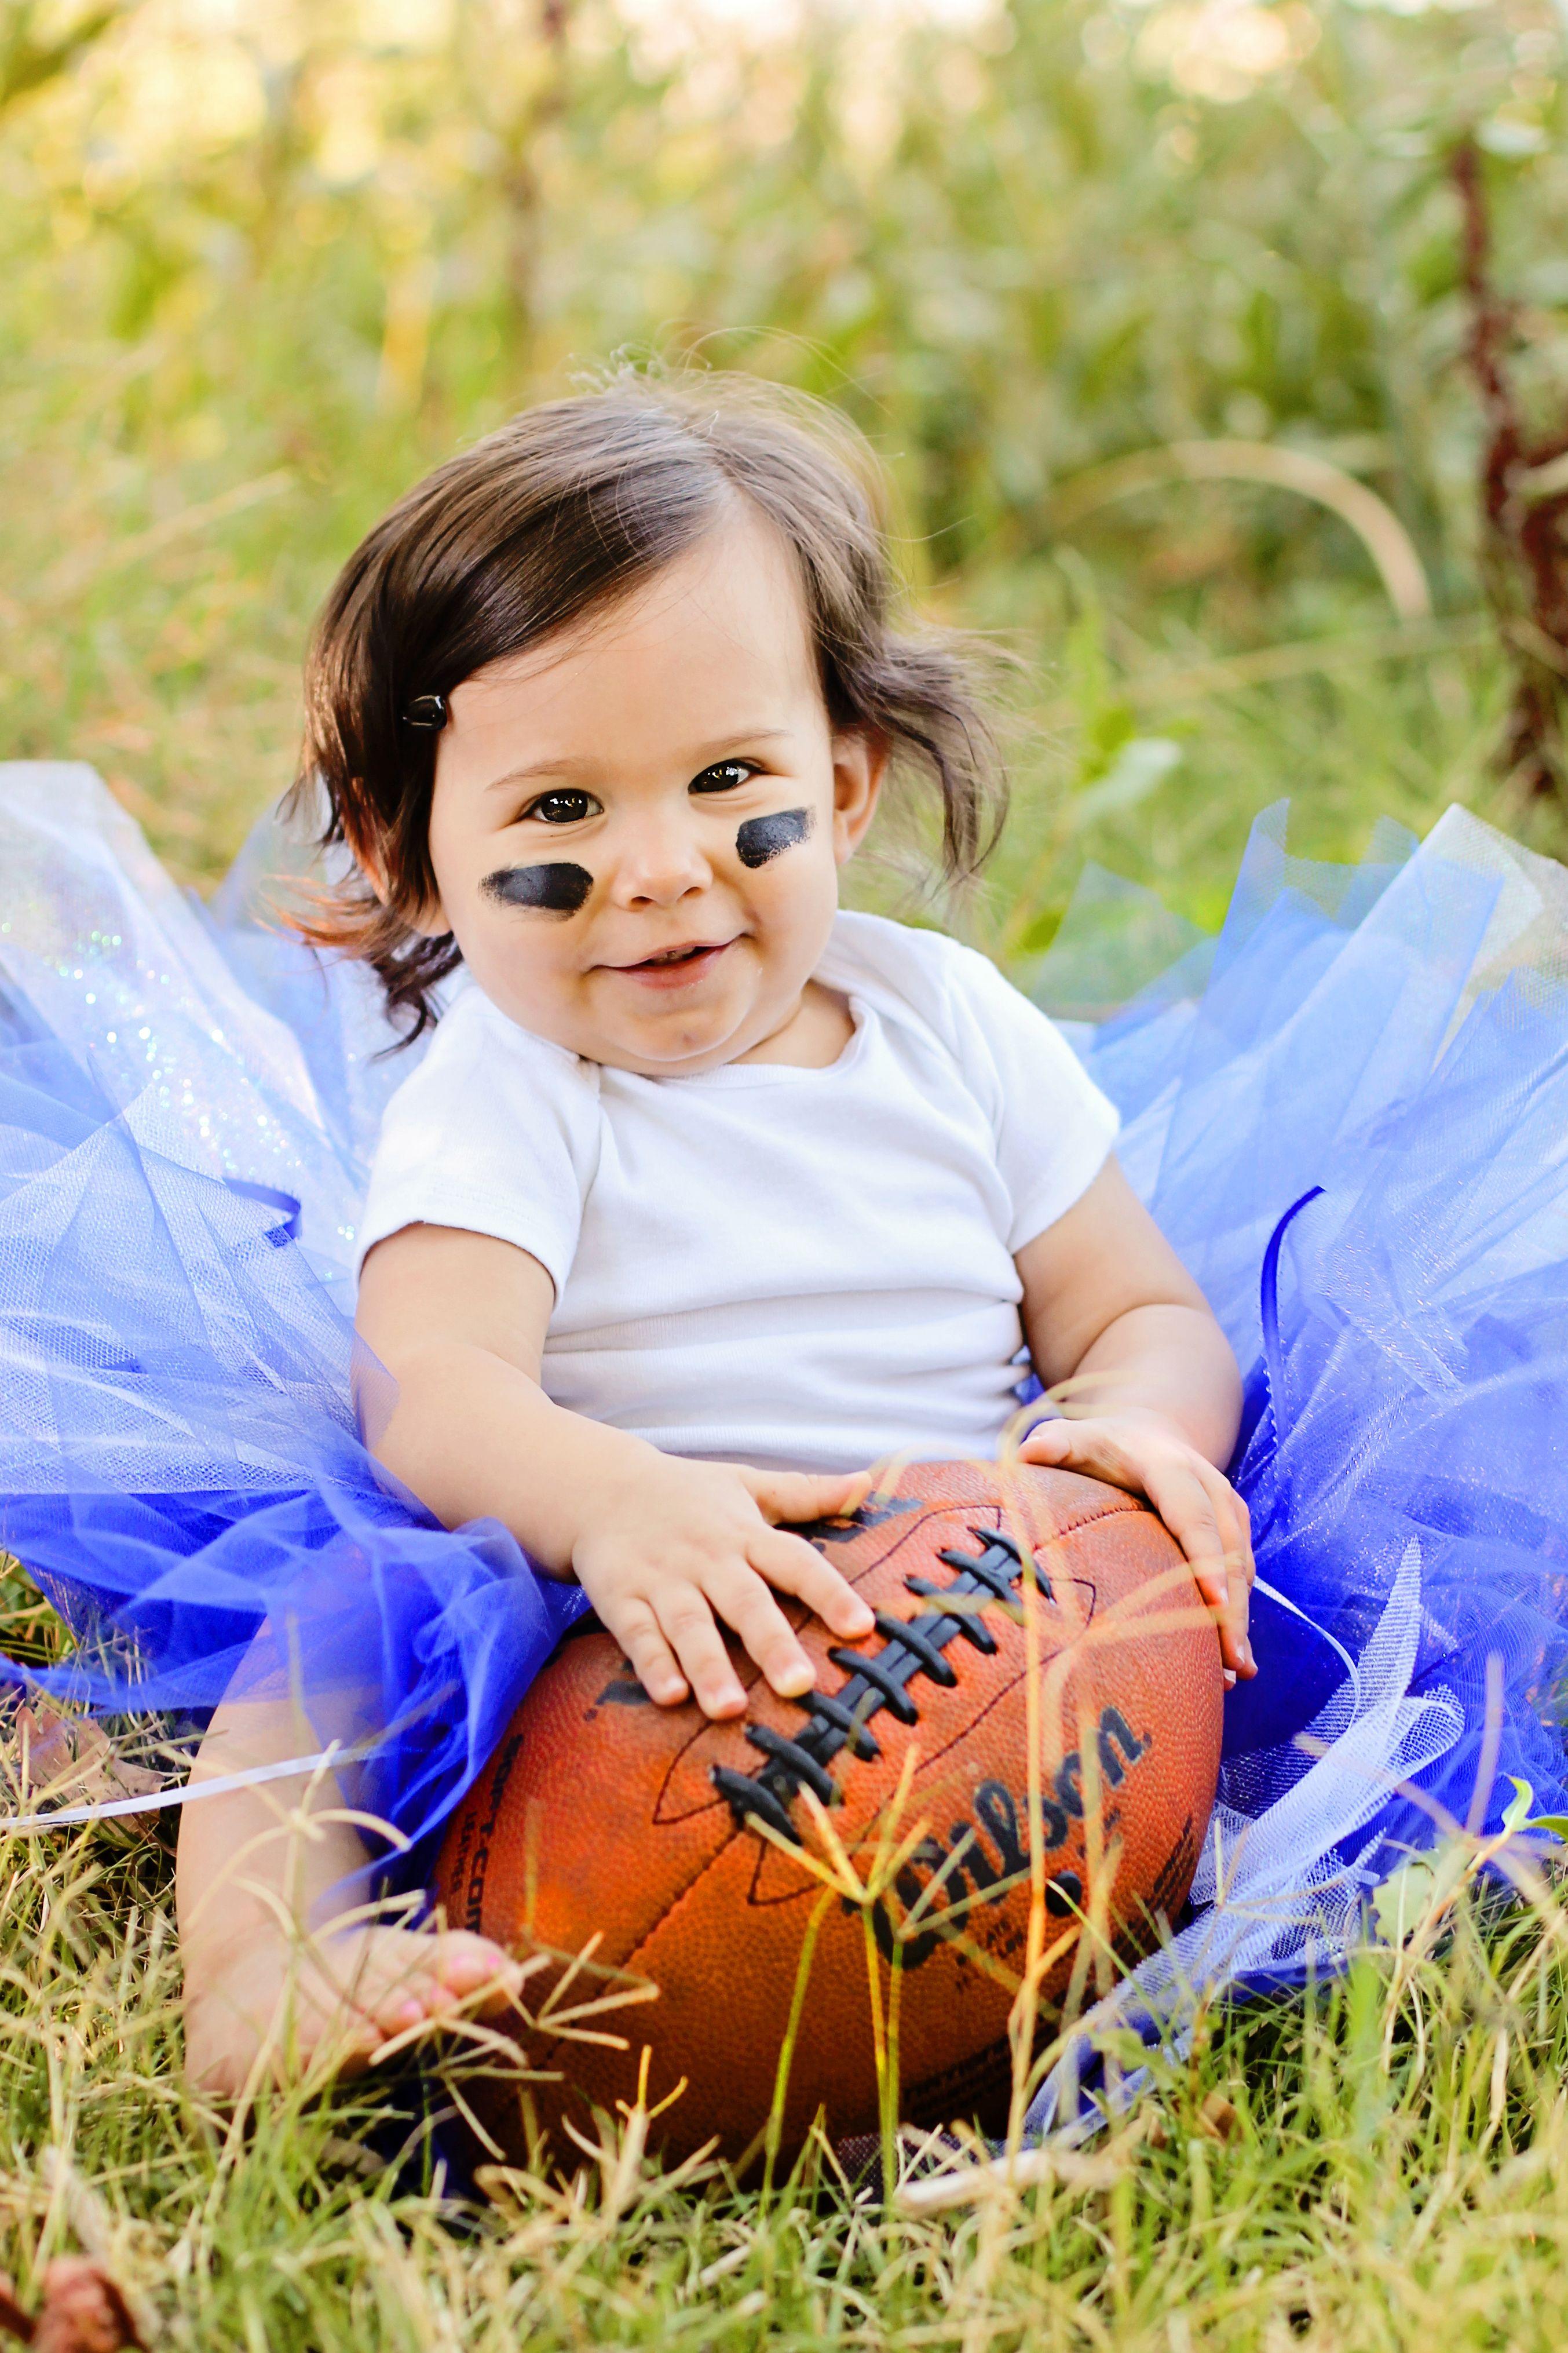 Outdoor photo shoot photography babies football tutu